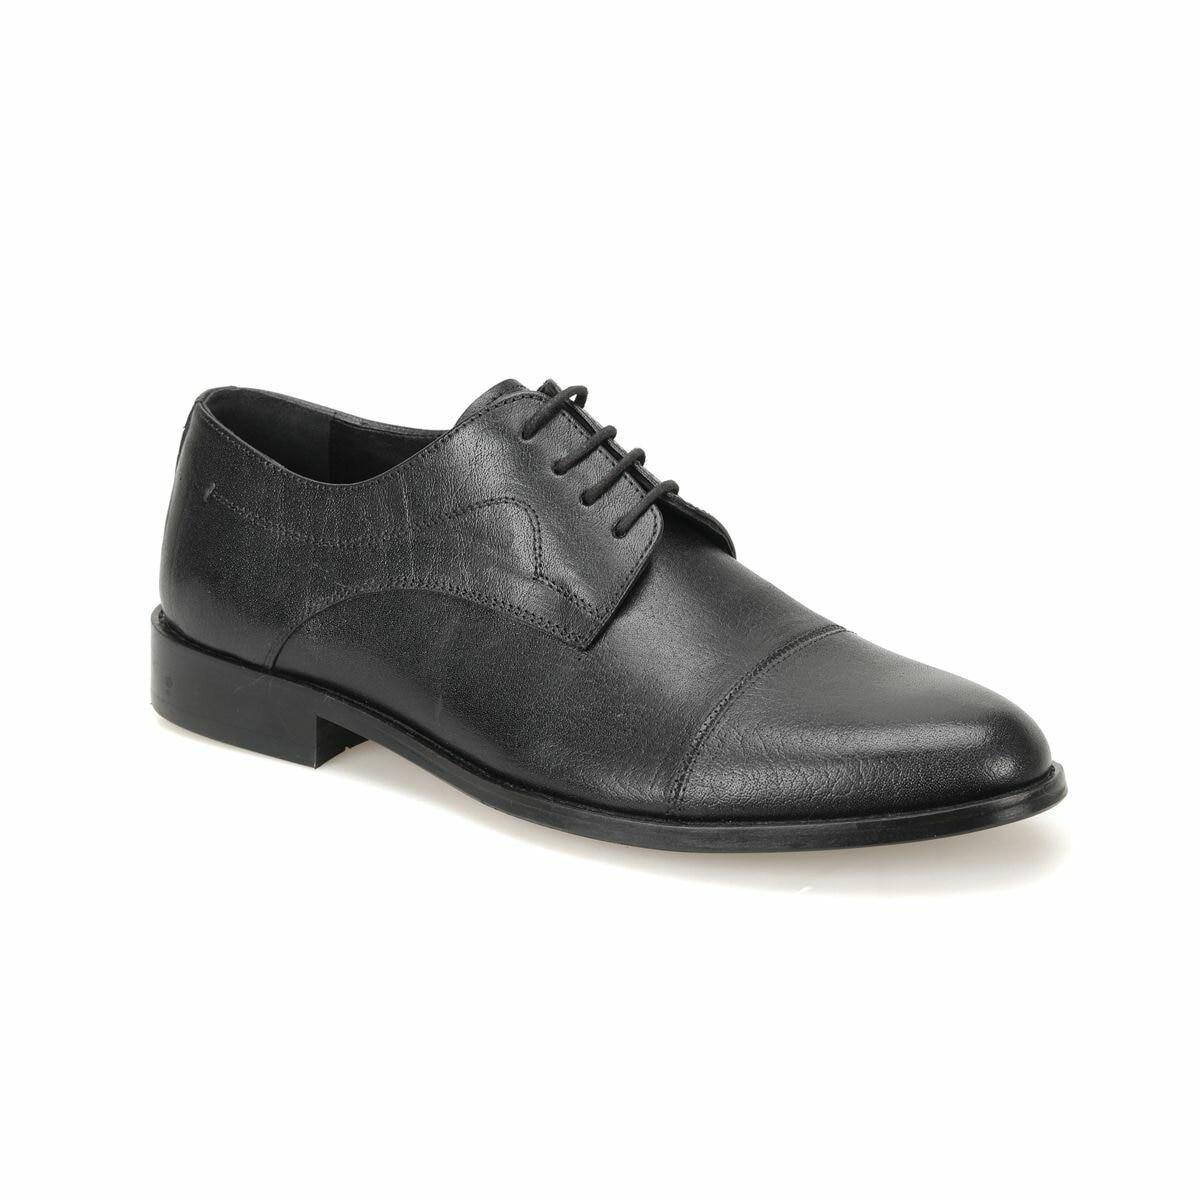 FLO 3607 Black Men 'S Classic Shoes Garamond